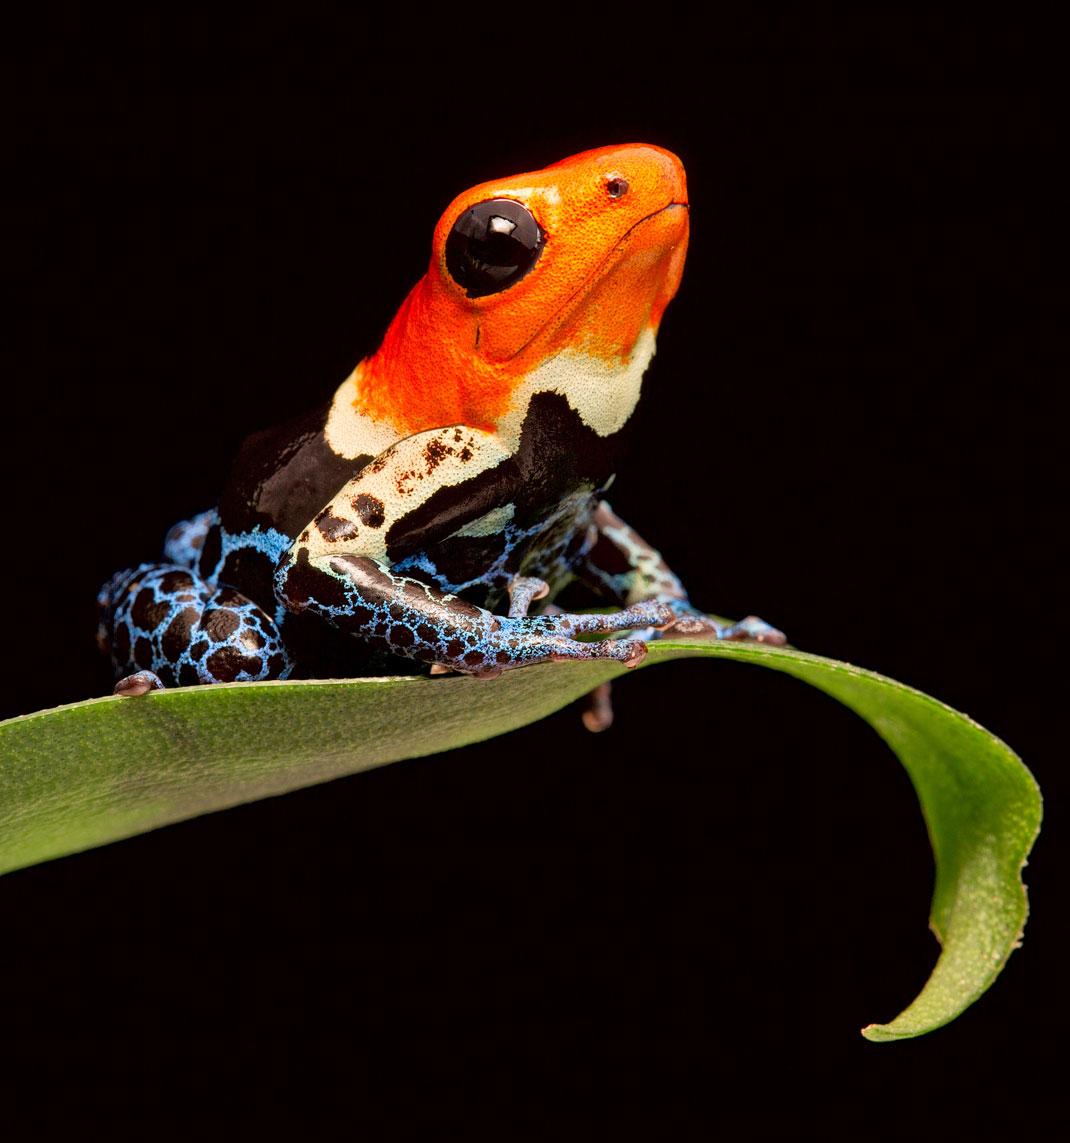 grenouilles-beaute-surprenante-contenu-une